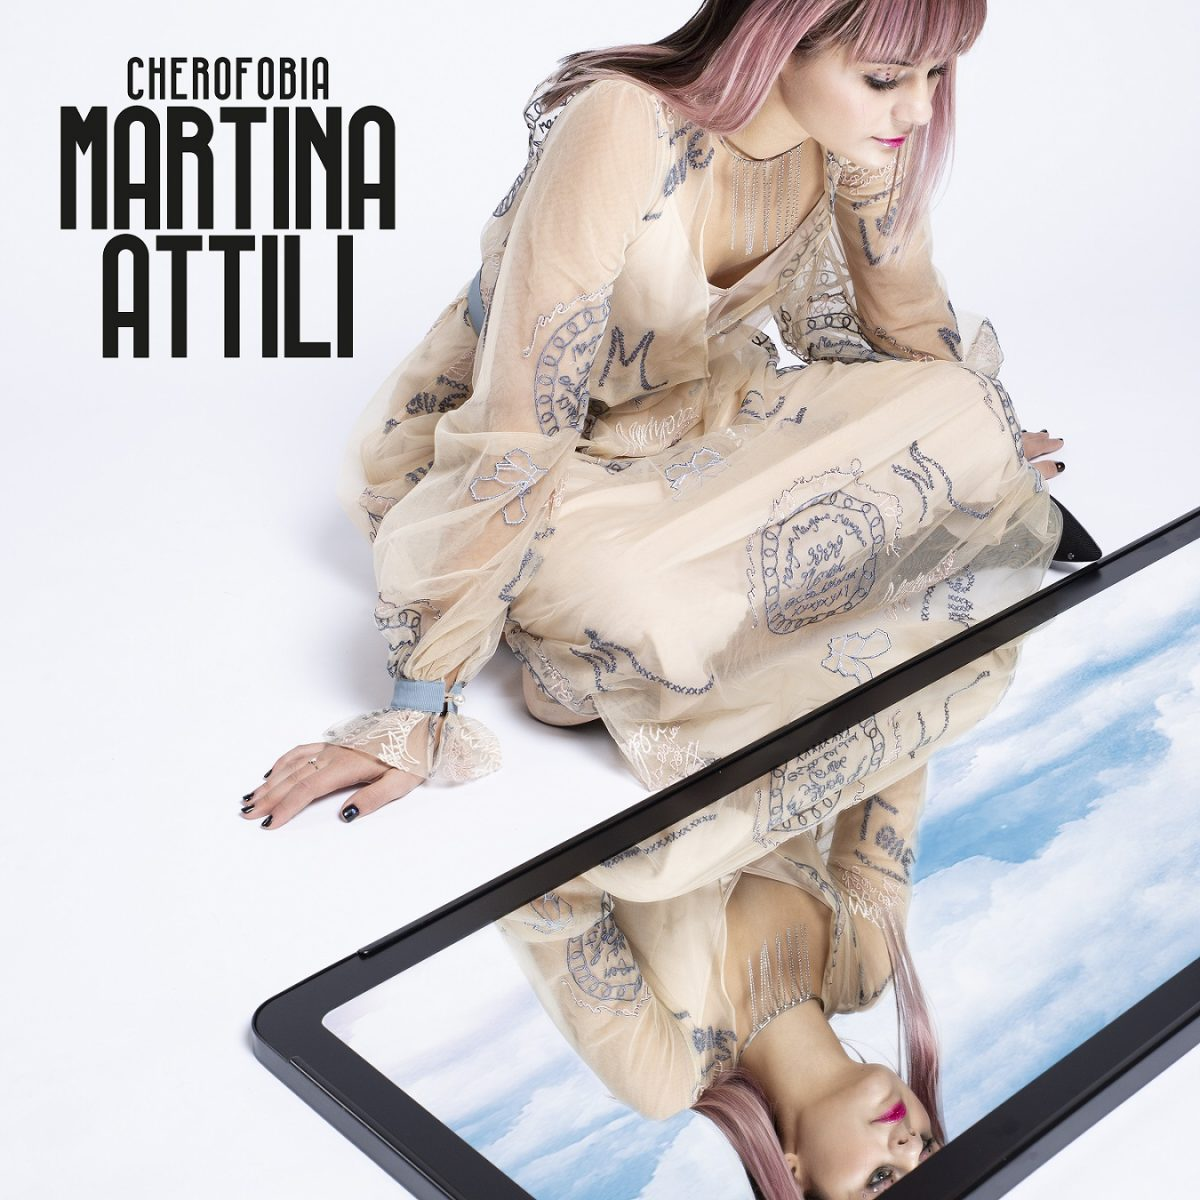 MARTINA_ATTILI_CHEROFOBIA_B